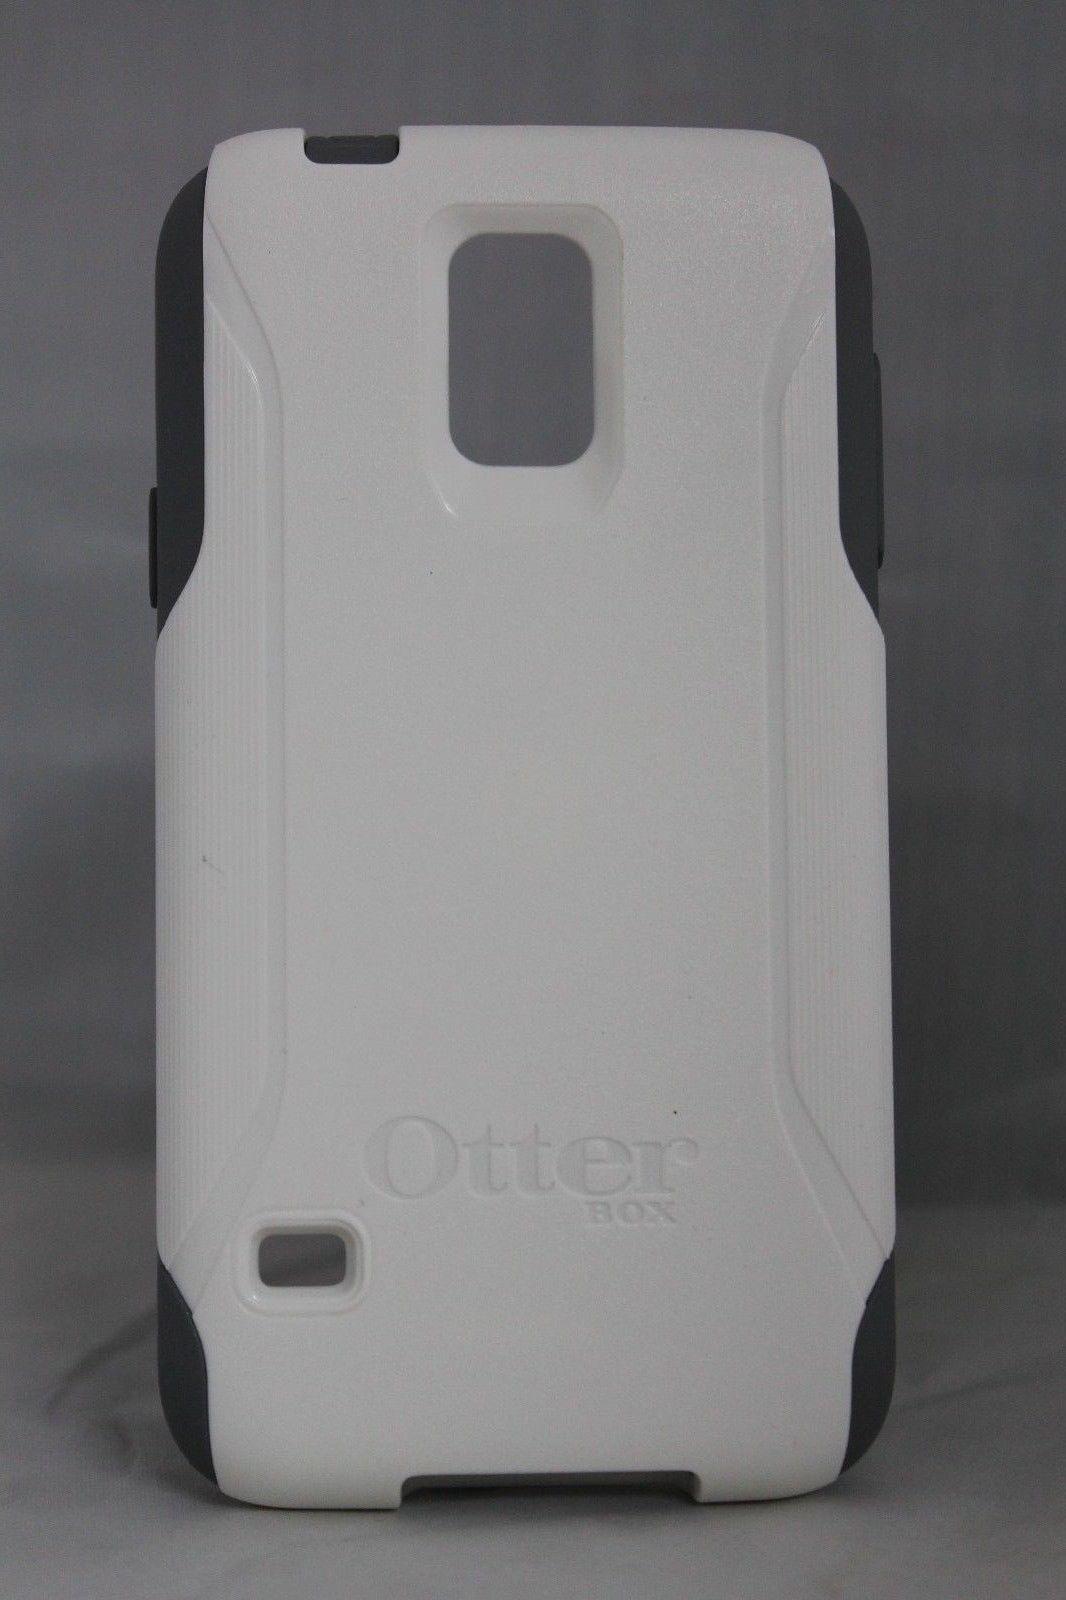 NEW 100% GENUINE OtterBo Galaxy S5 Commuter Series Case white/gray or black